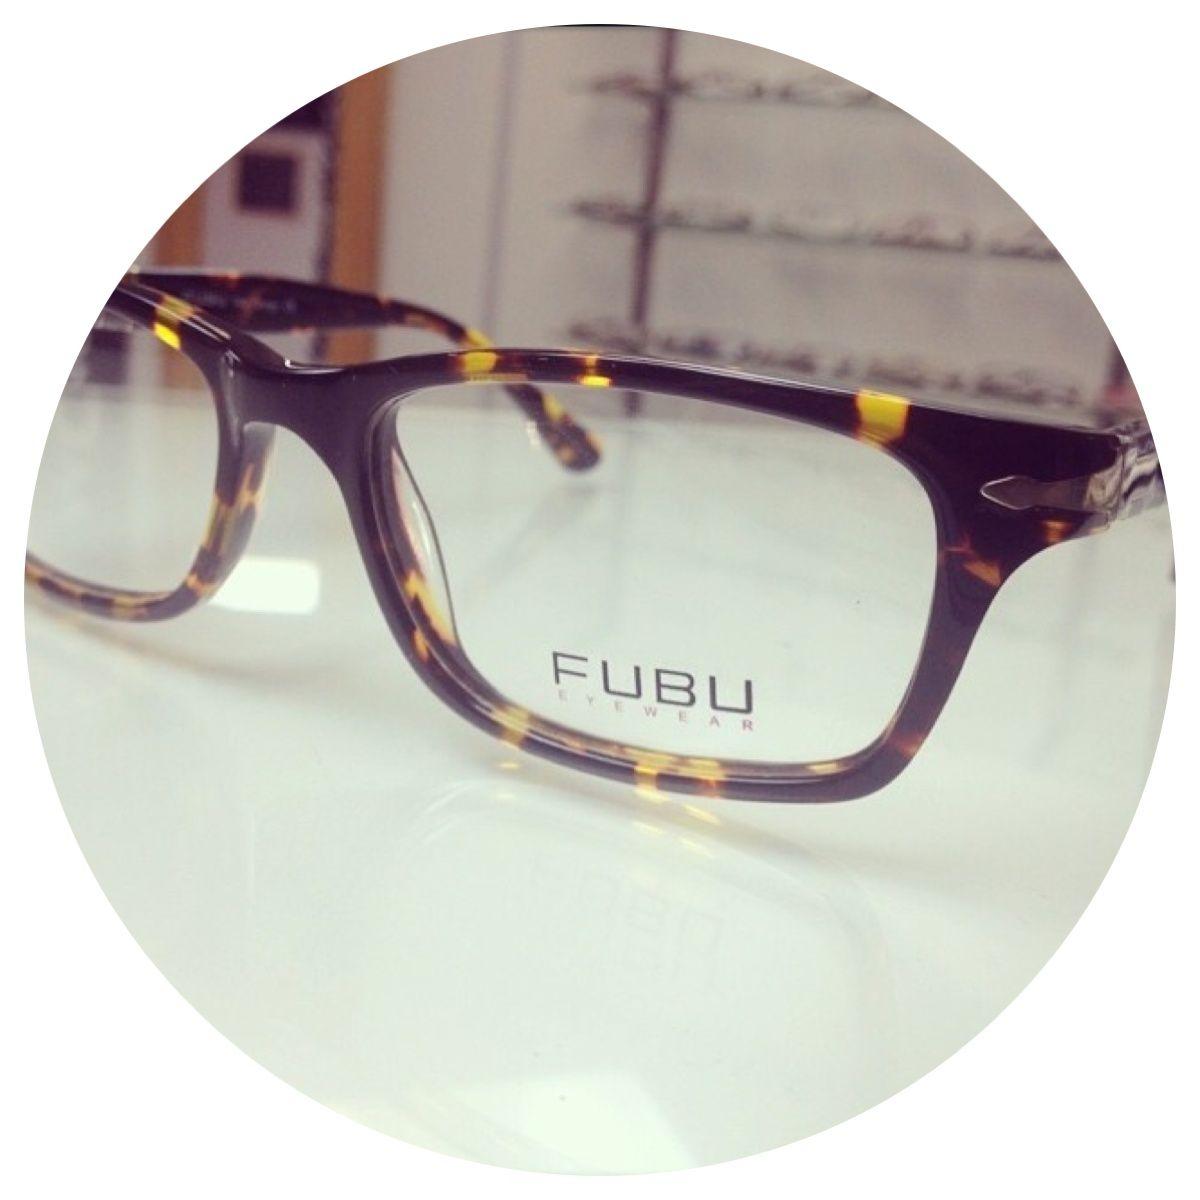 fubu eyewear at walls optometrist walls